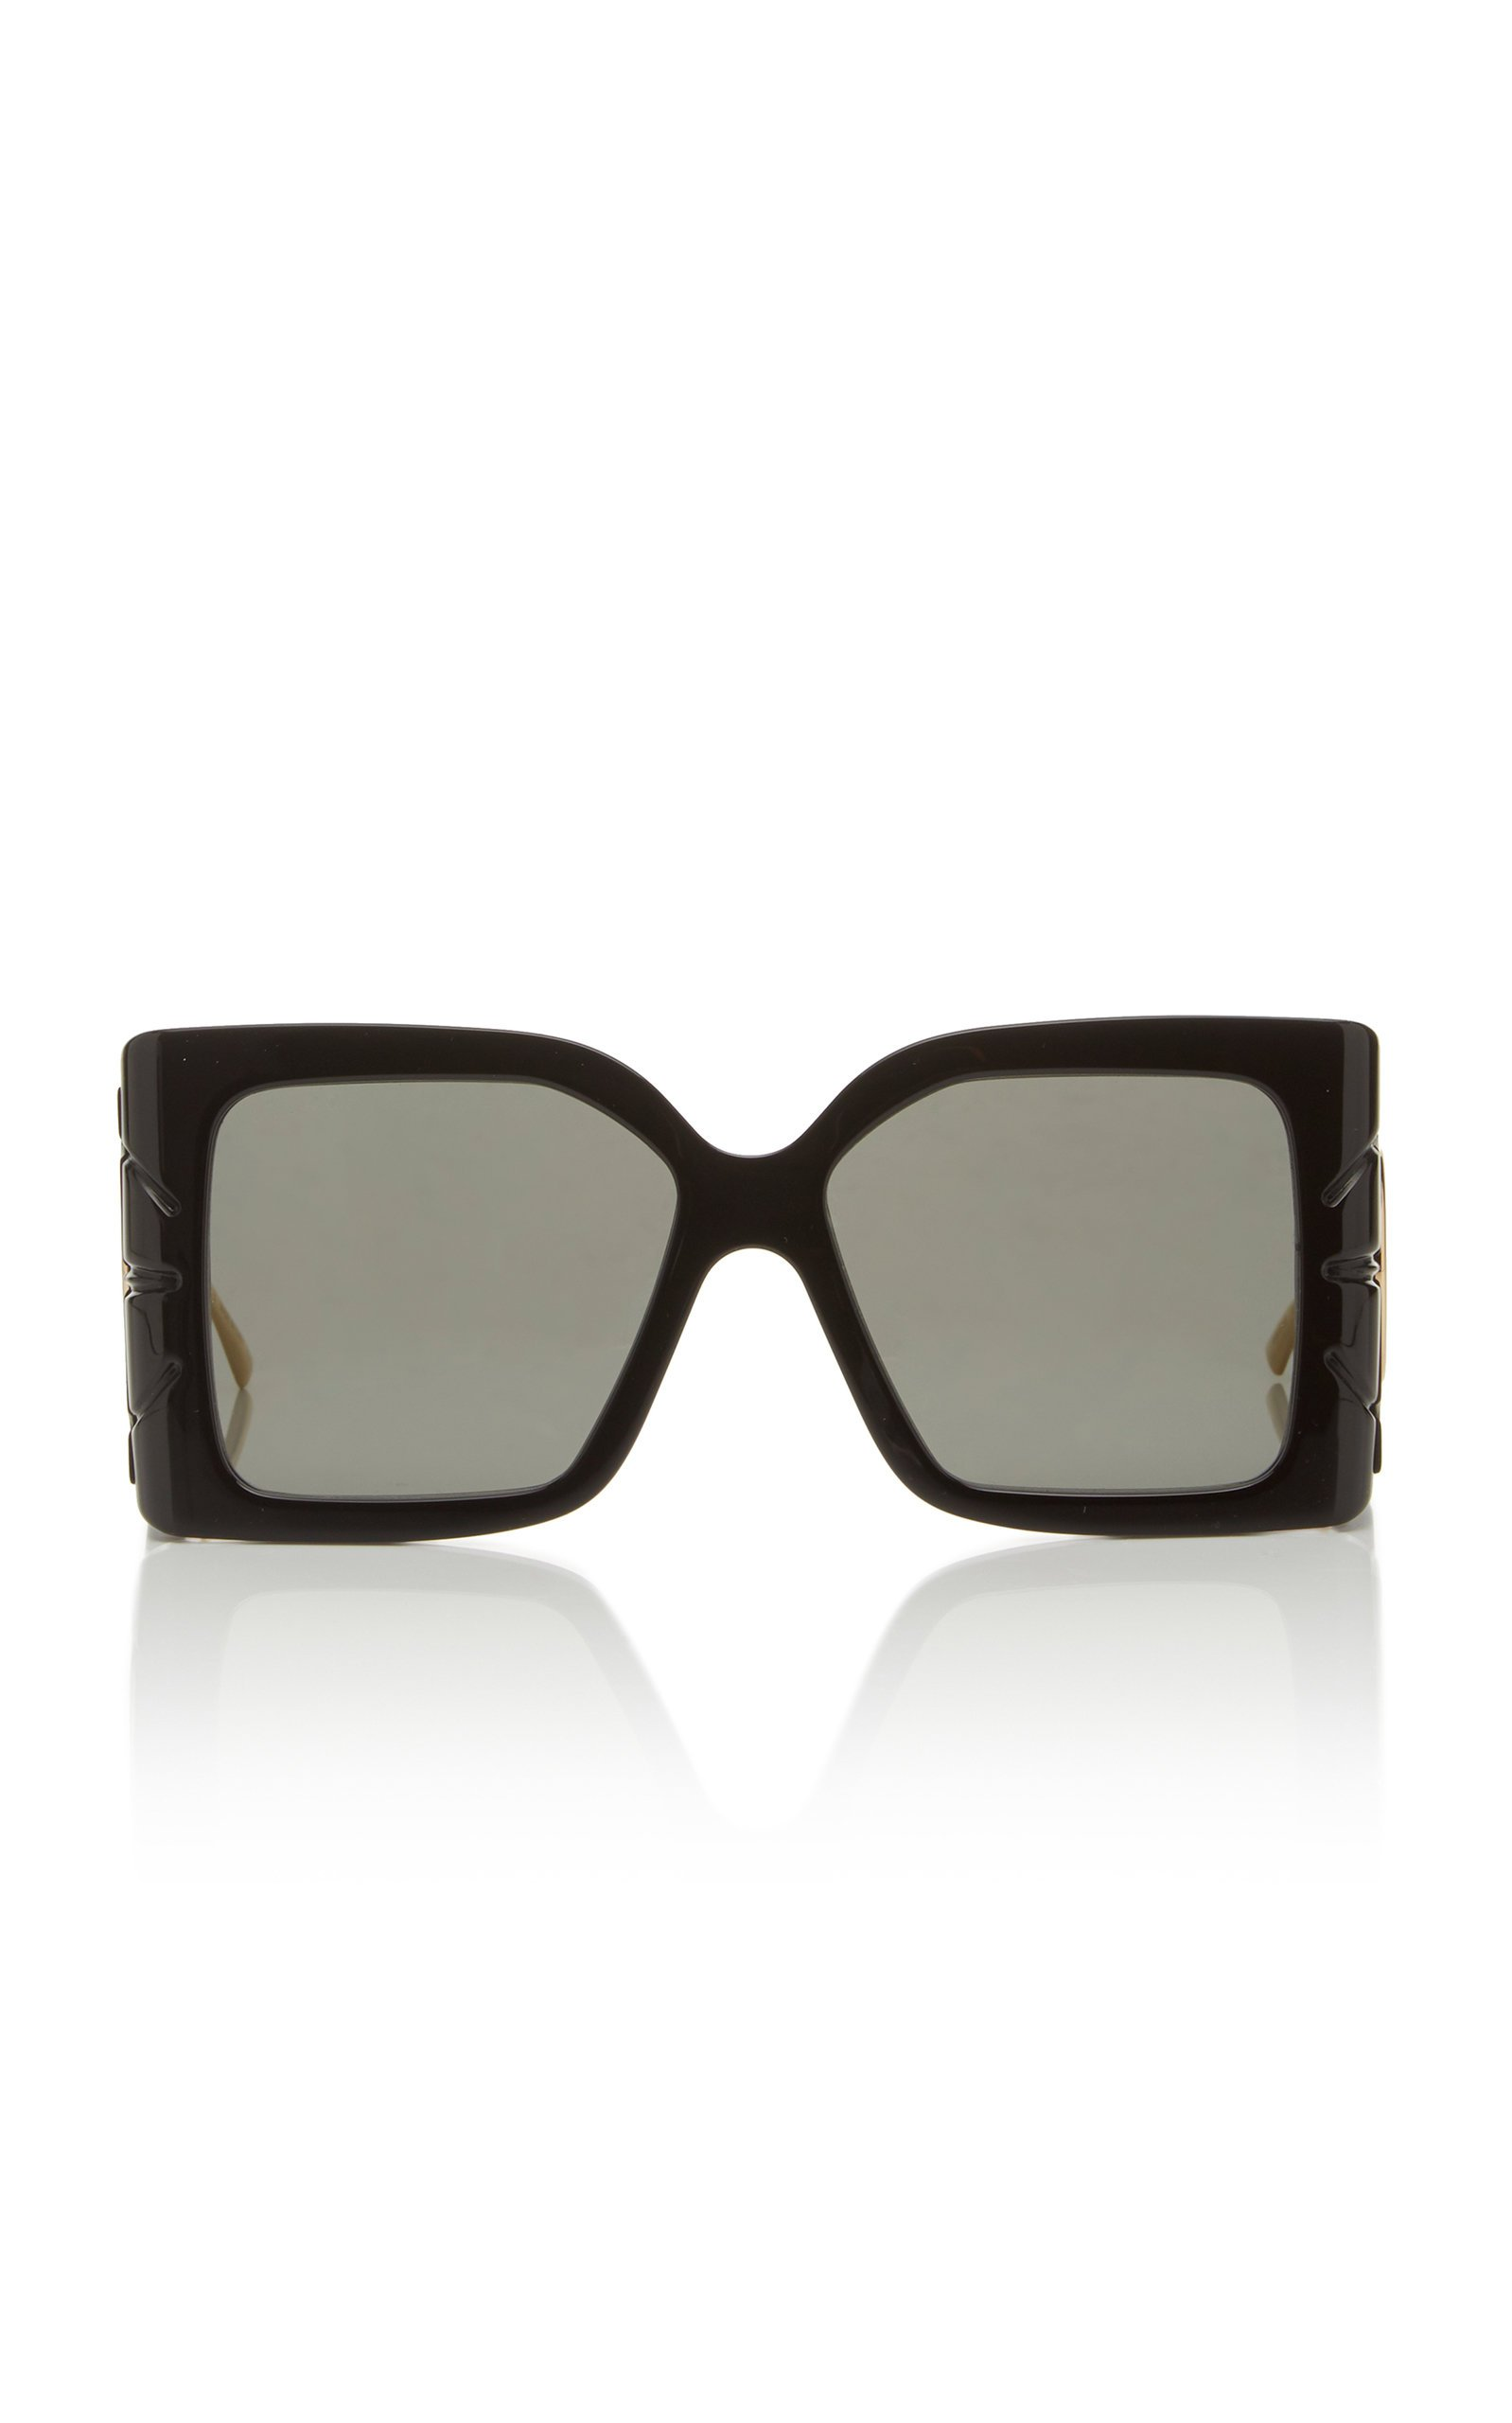 Gucci Sunglasses Acetate Oversized Square-Frame Sunglasses